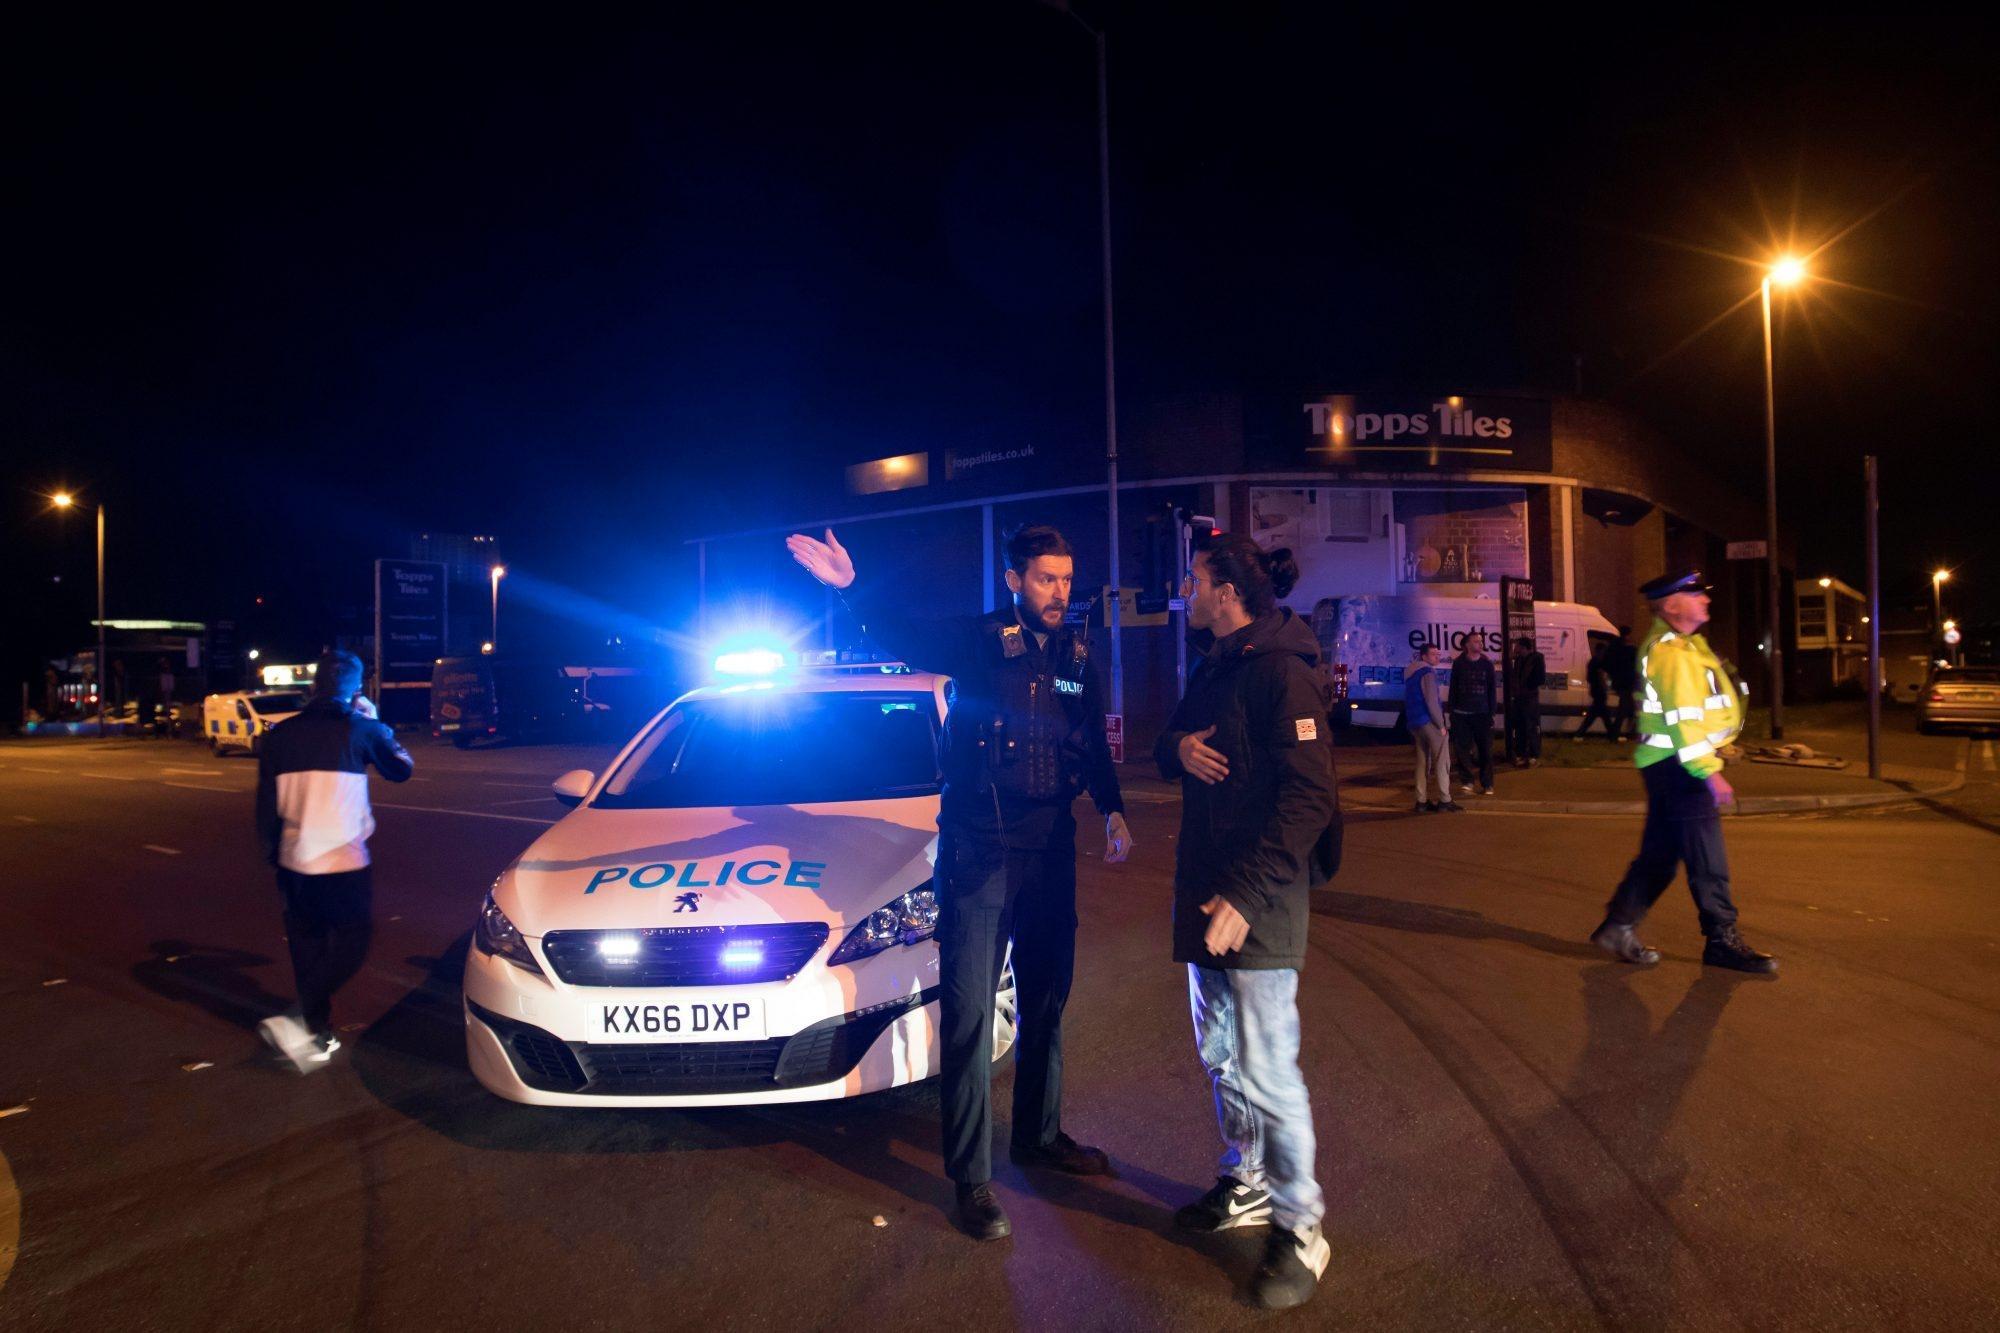 News Wrap: UK police confirm fatalities after concert blast